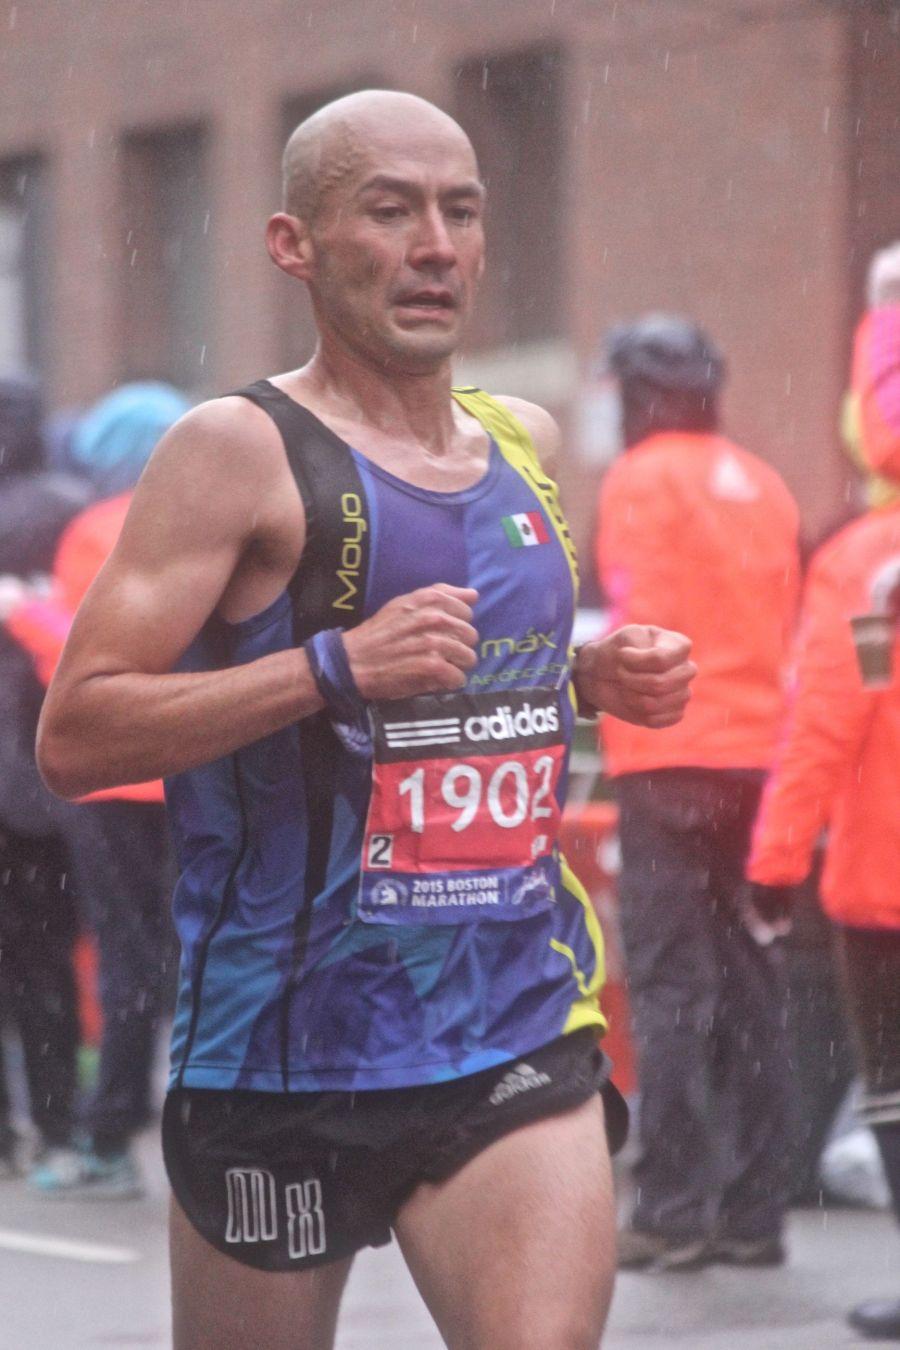 boston marathon april 20 2015 racer number 1902 rain